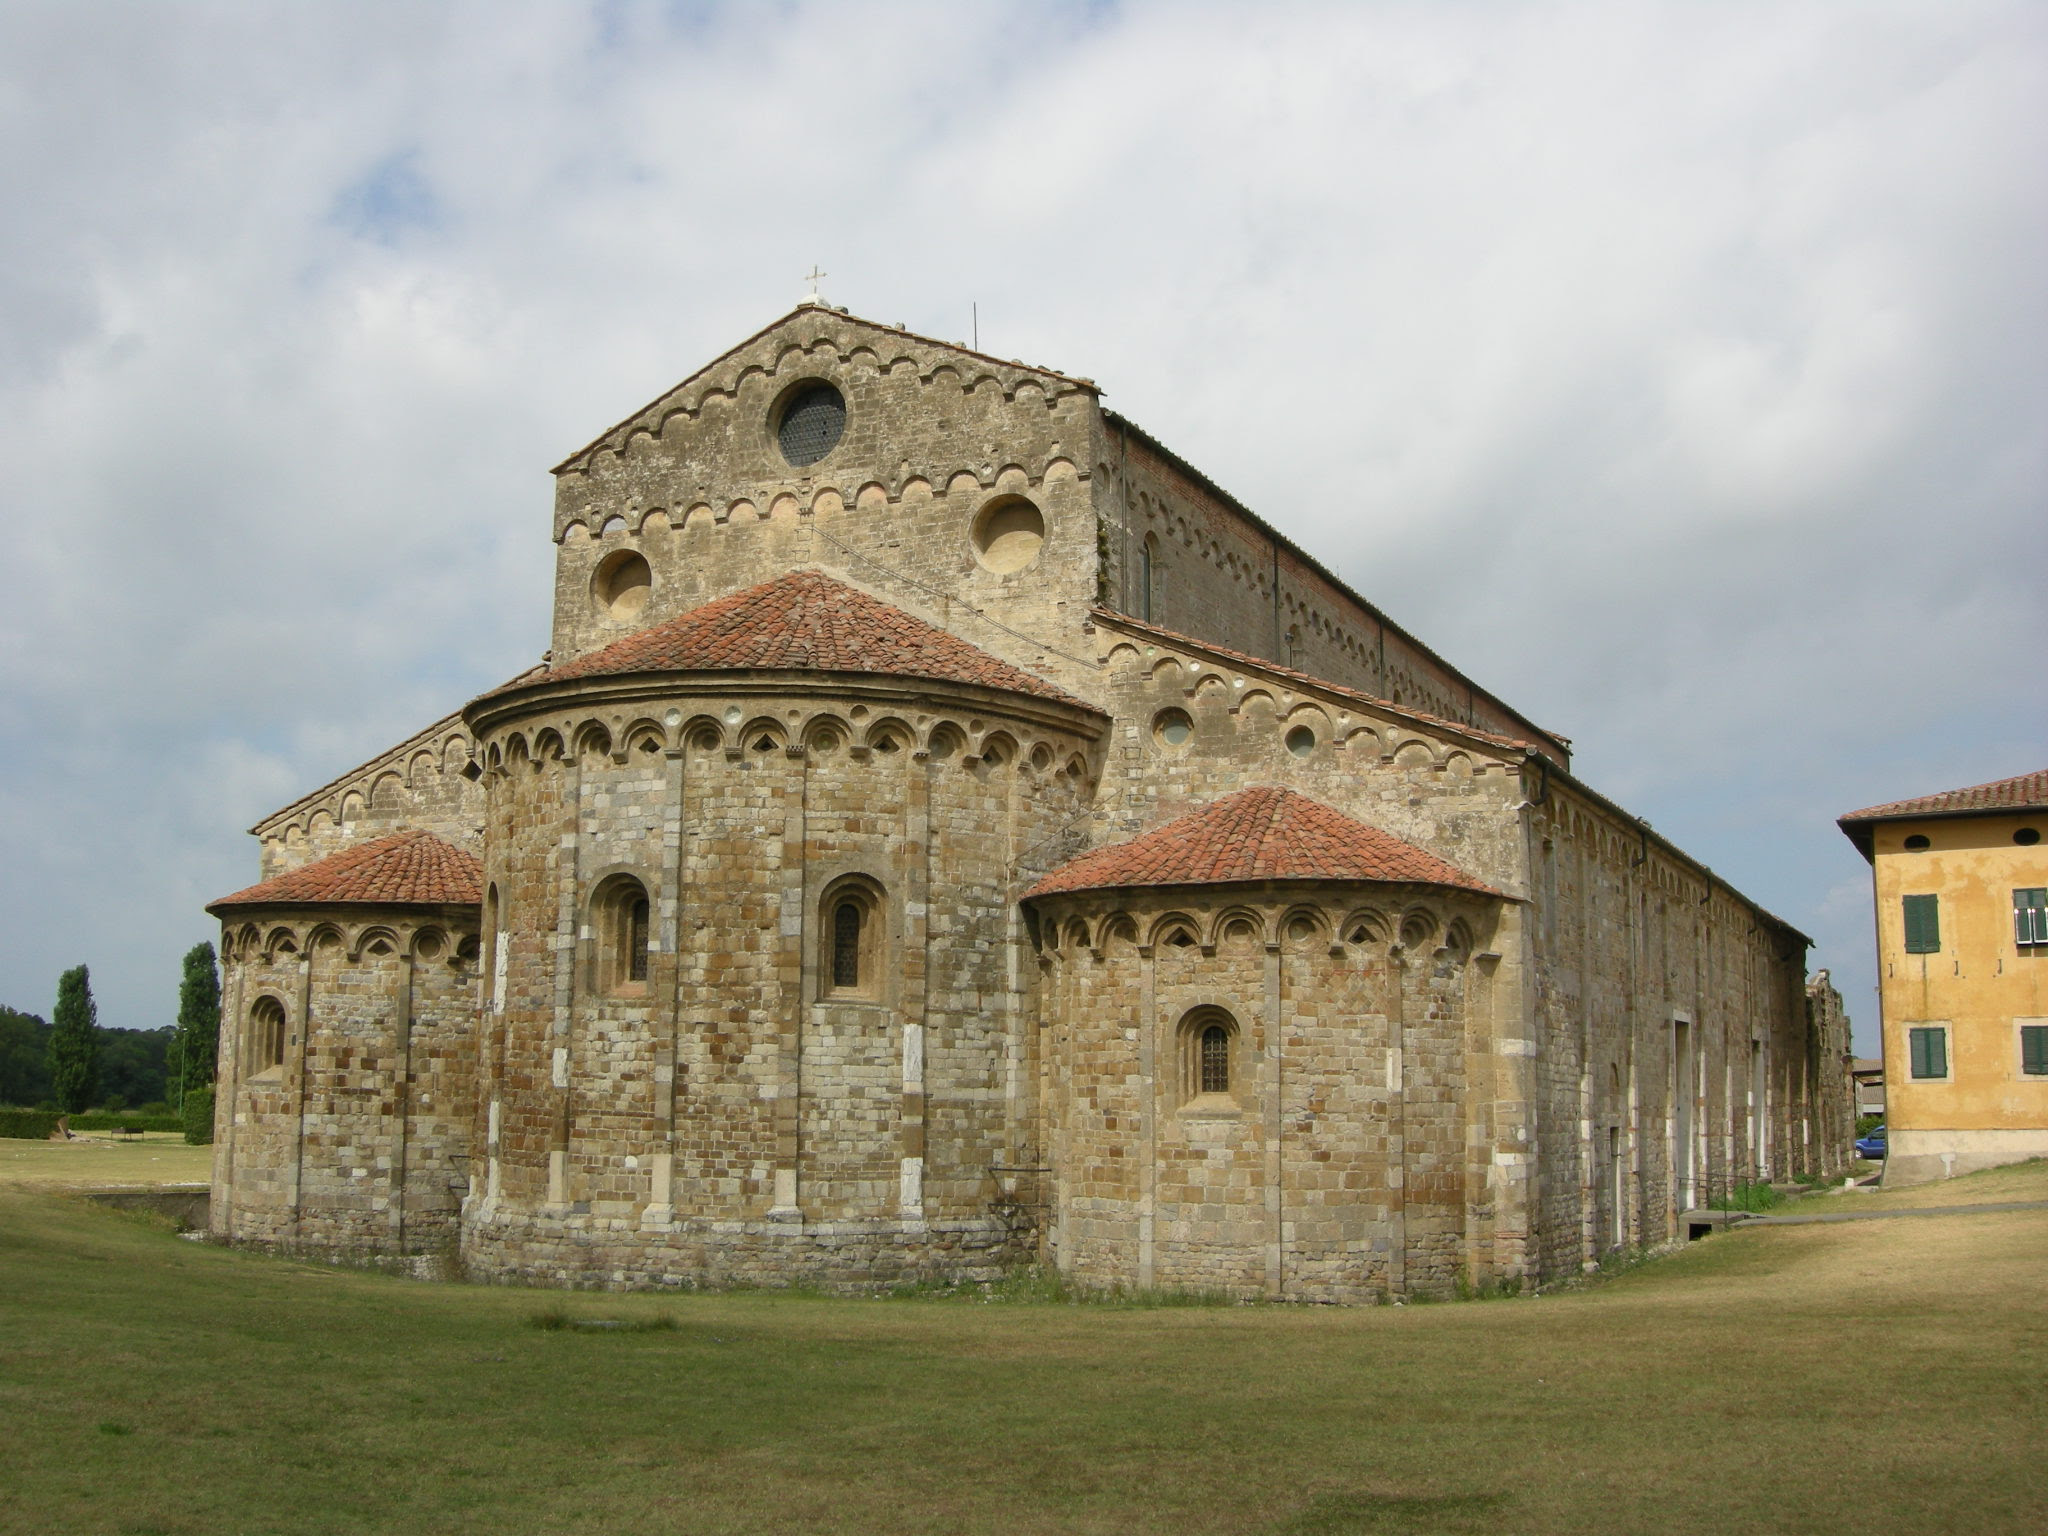 San Piero A Grado CliccaLivorno